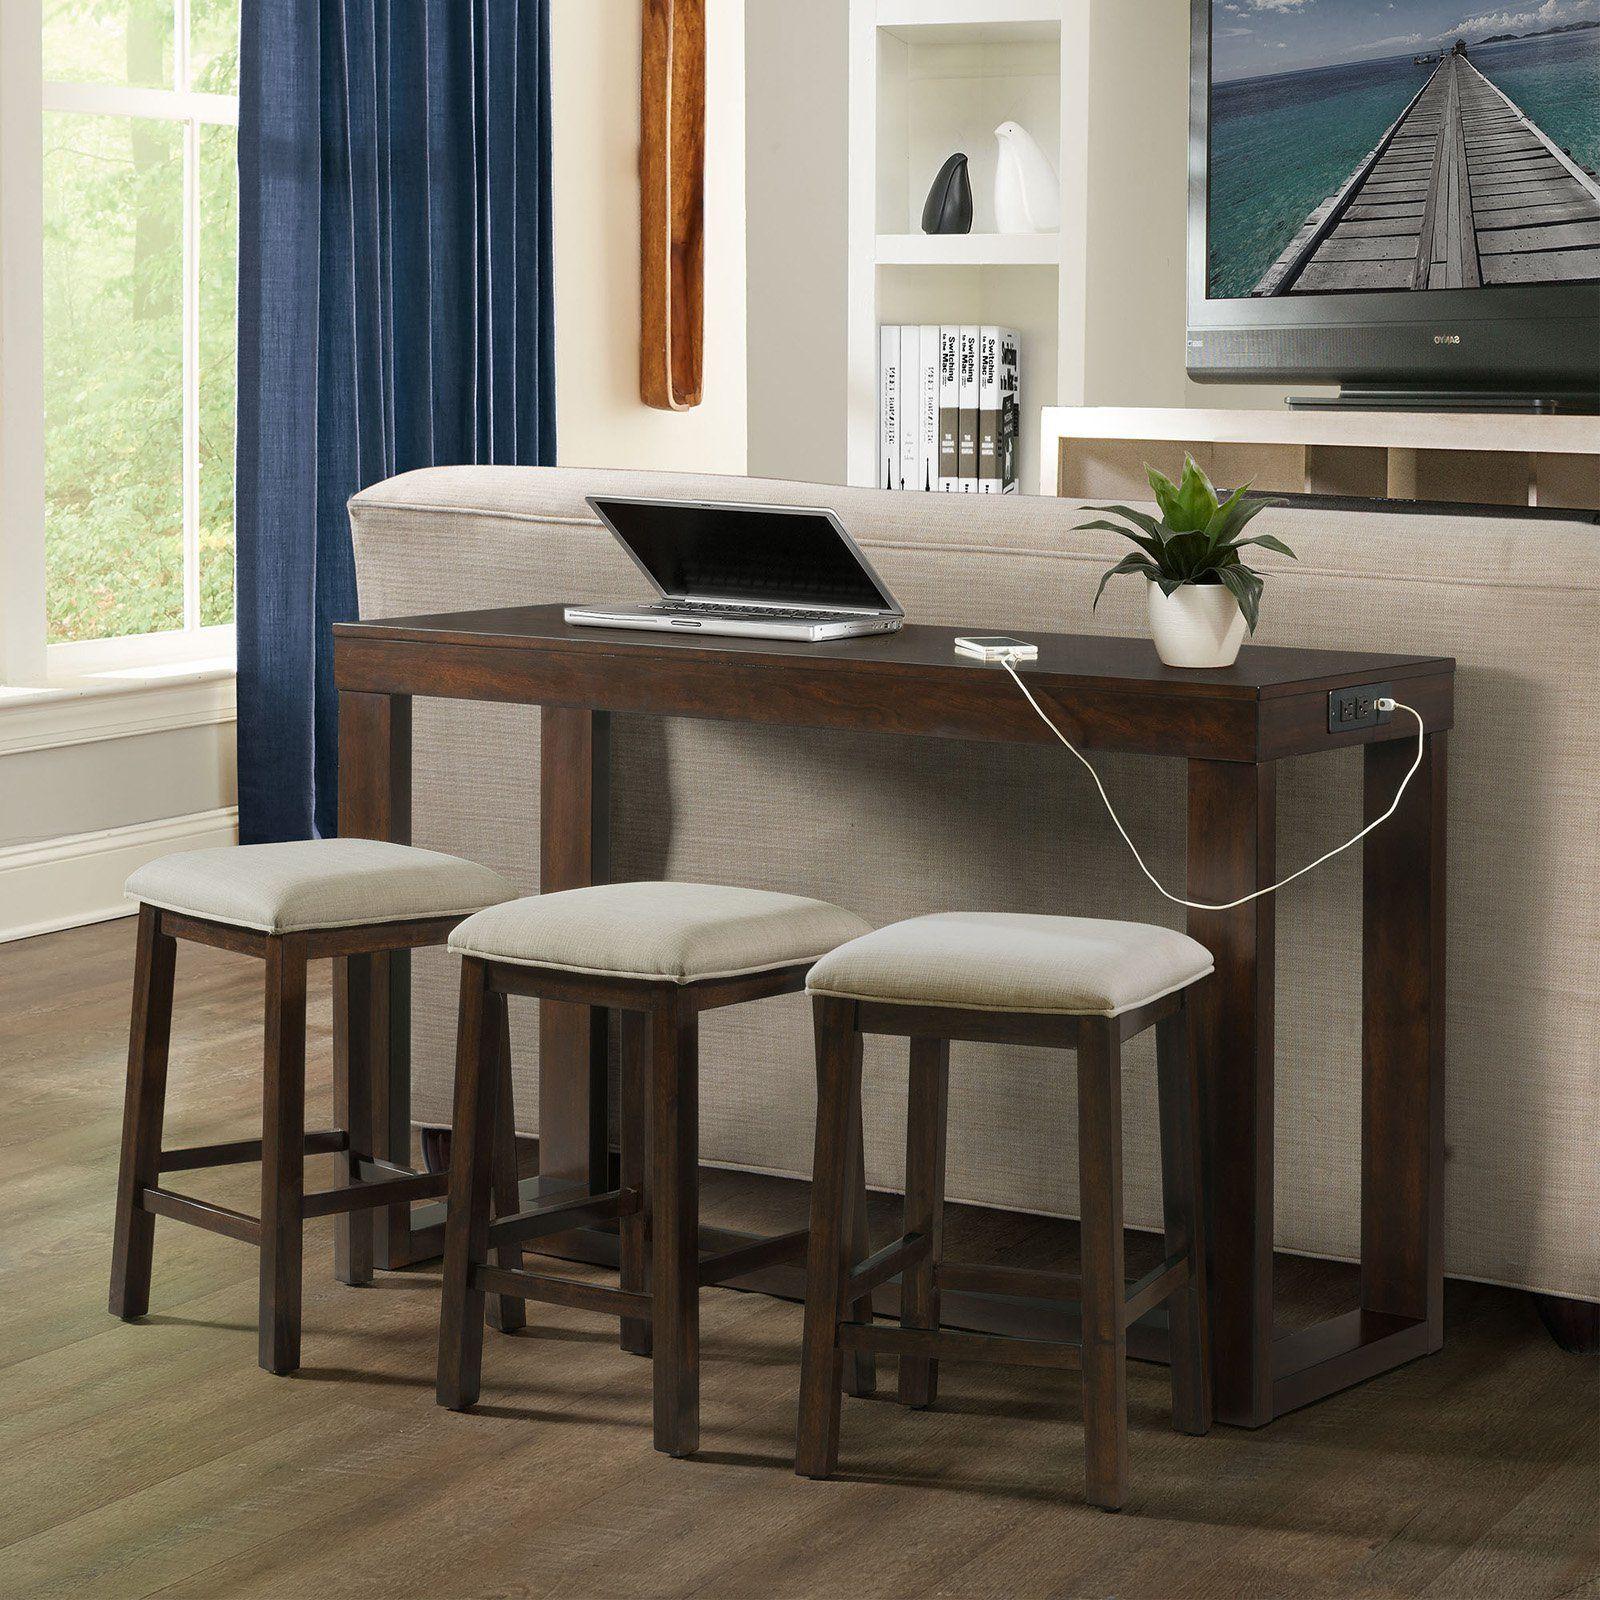 Terrific Picket House Furnishings Drew Multipurpose Console Table Set Cjindustries Chair Design For Home Cjindustriesco